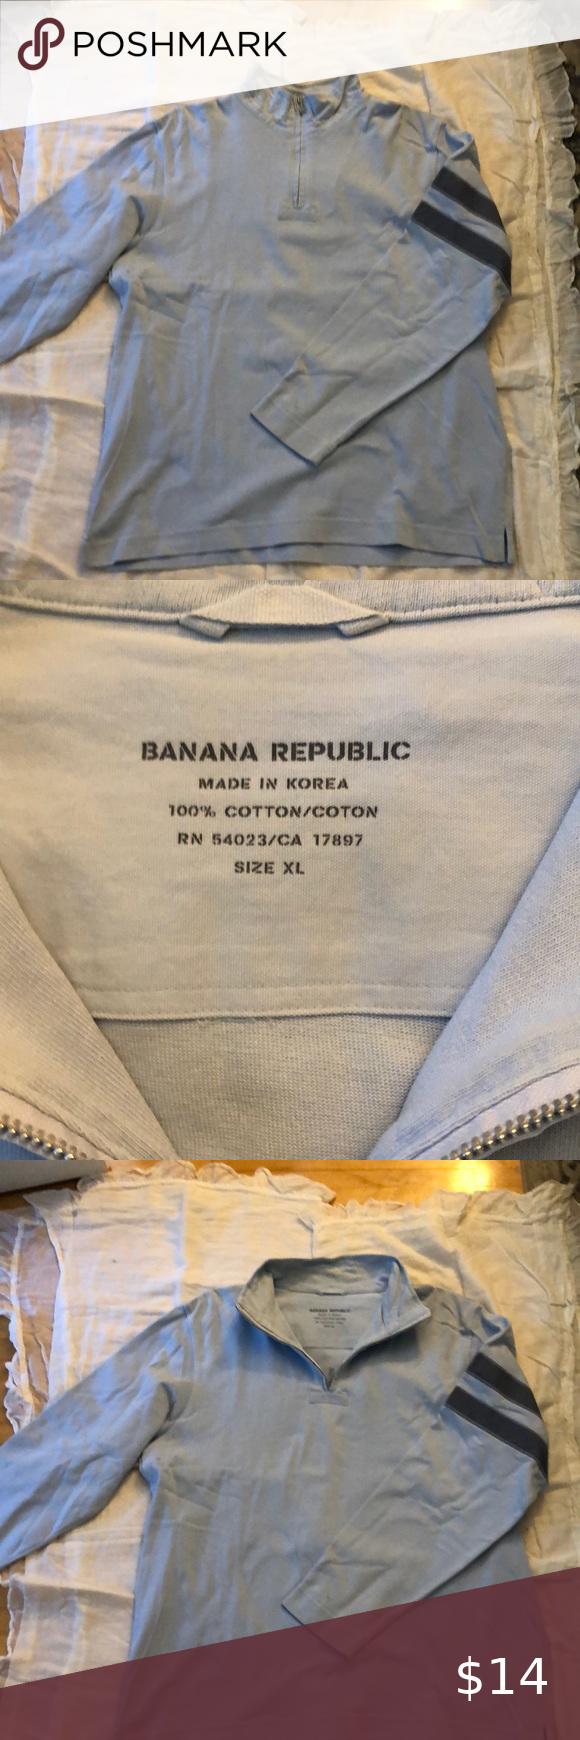 Banana Republic Men S Sweatshirt Long Sleeve Tshirt Men Banana Republic Men Mens Sweatshirts [ 1740 x 580 Pixel ]